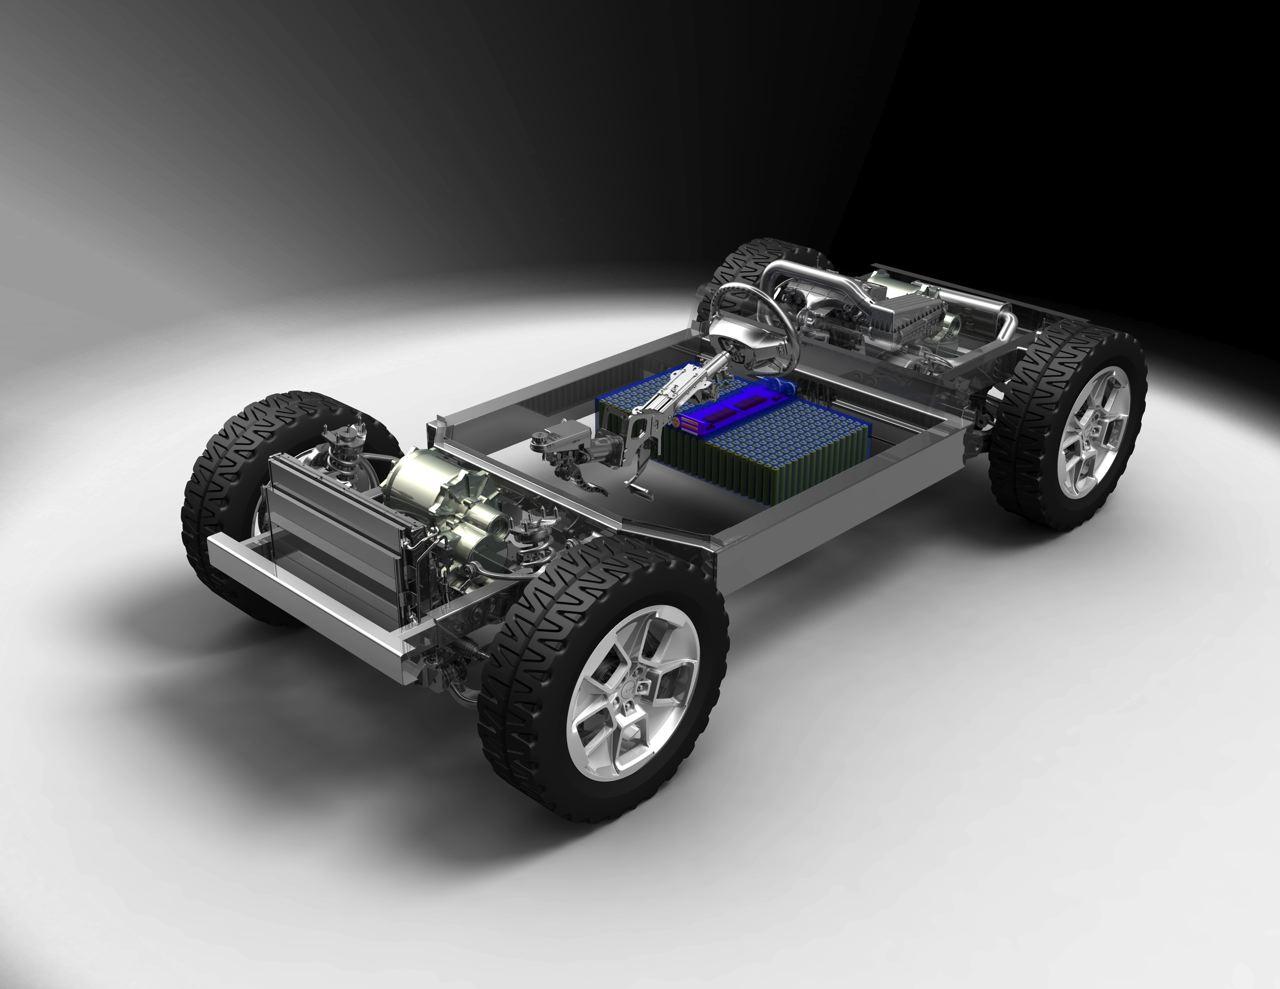 nuevo jeep renegade concept diablomotor f1 2017. Black Bedroom Furniture Sets. Home Design Ideas